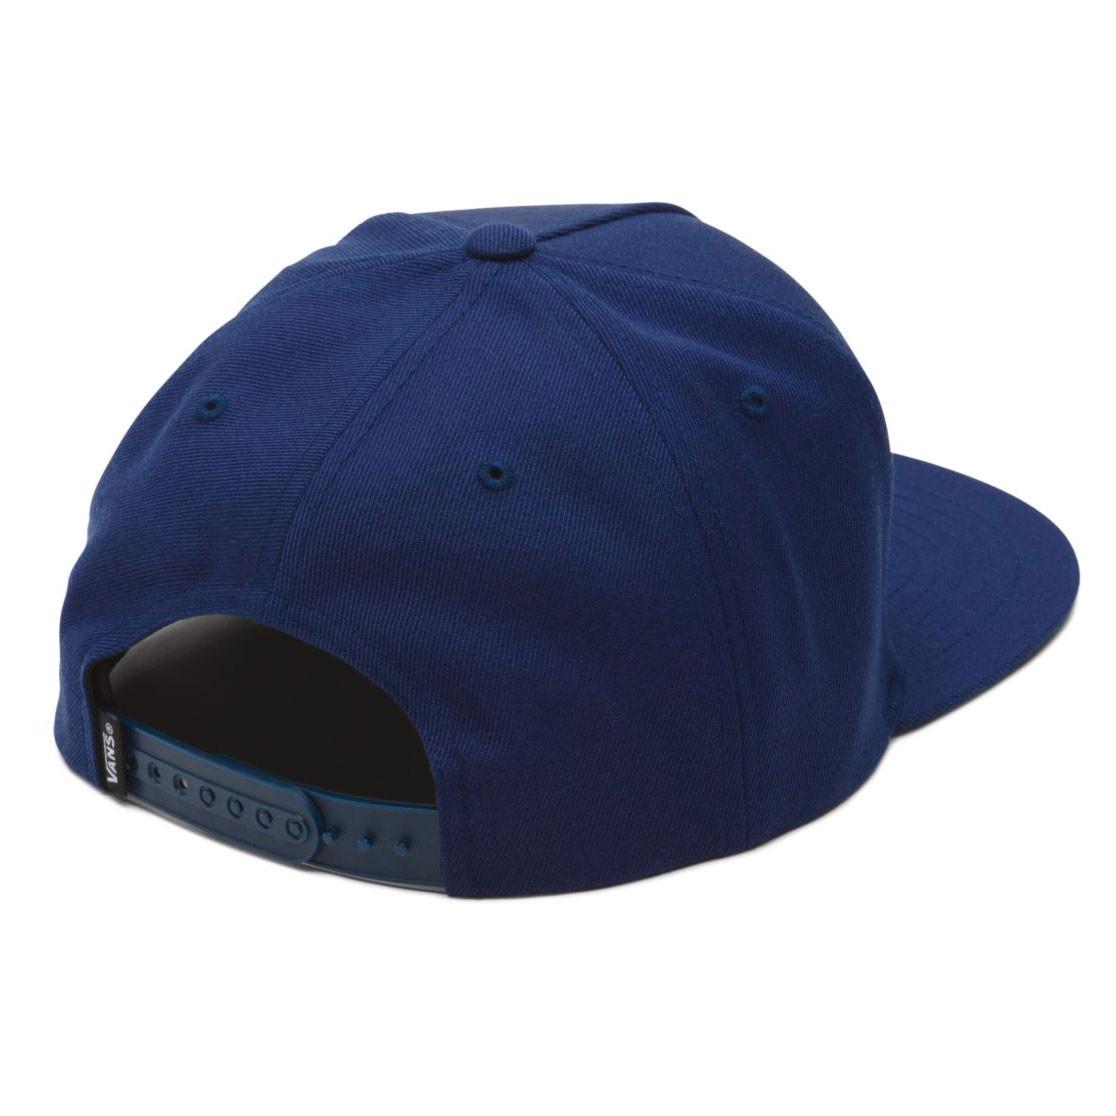 ab3ee2259f Cap Vans Full Patch Snapback dress blues